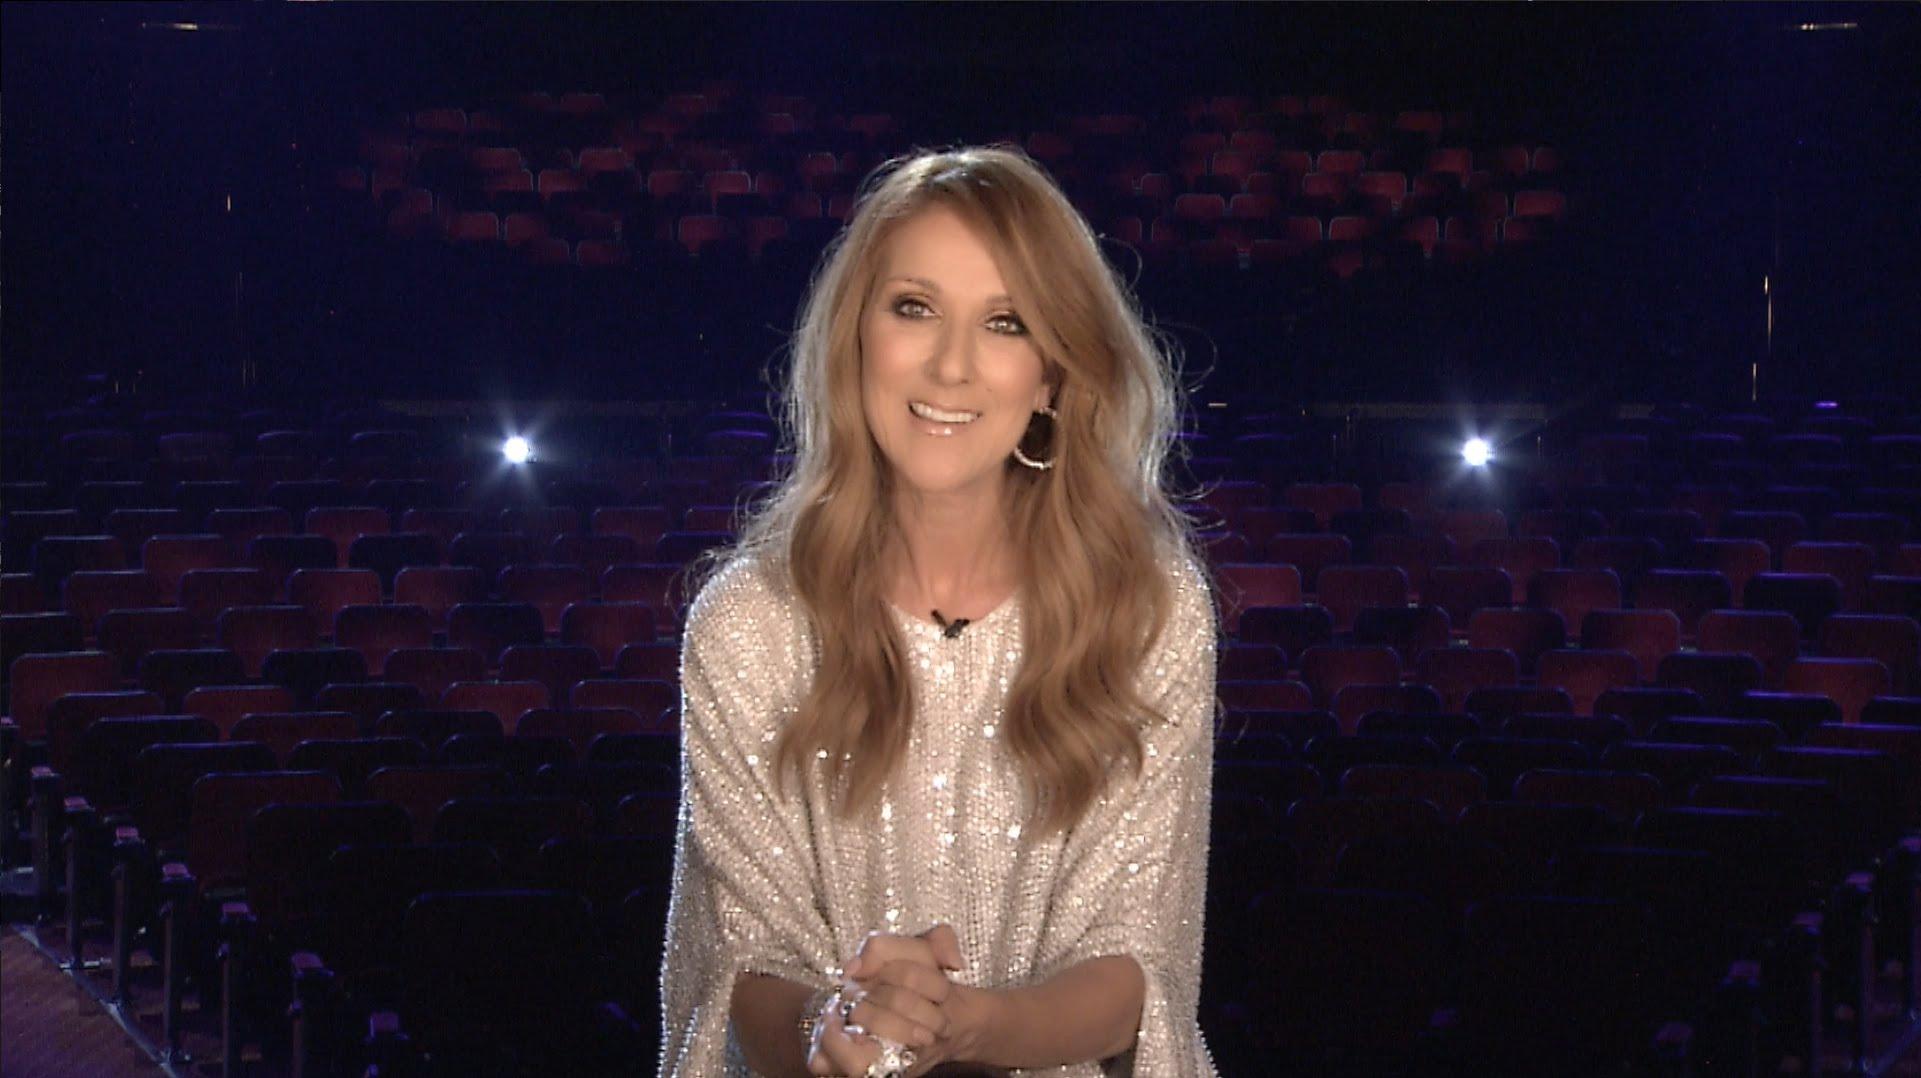 Céline Dion announces 2015 return to Caesars Palace in Las Vegas on August 27